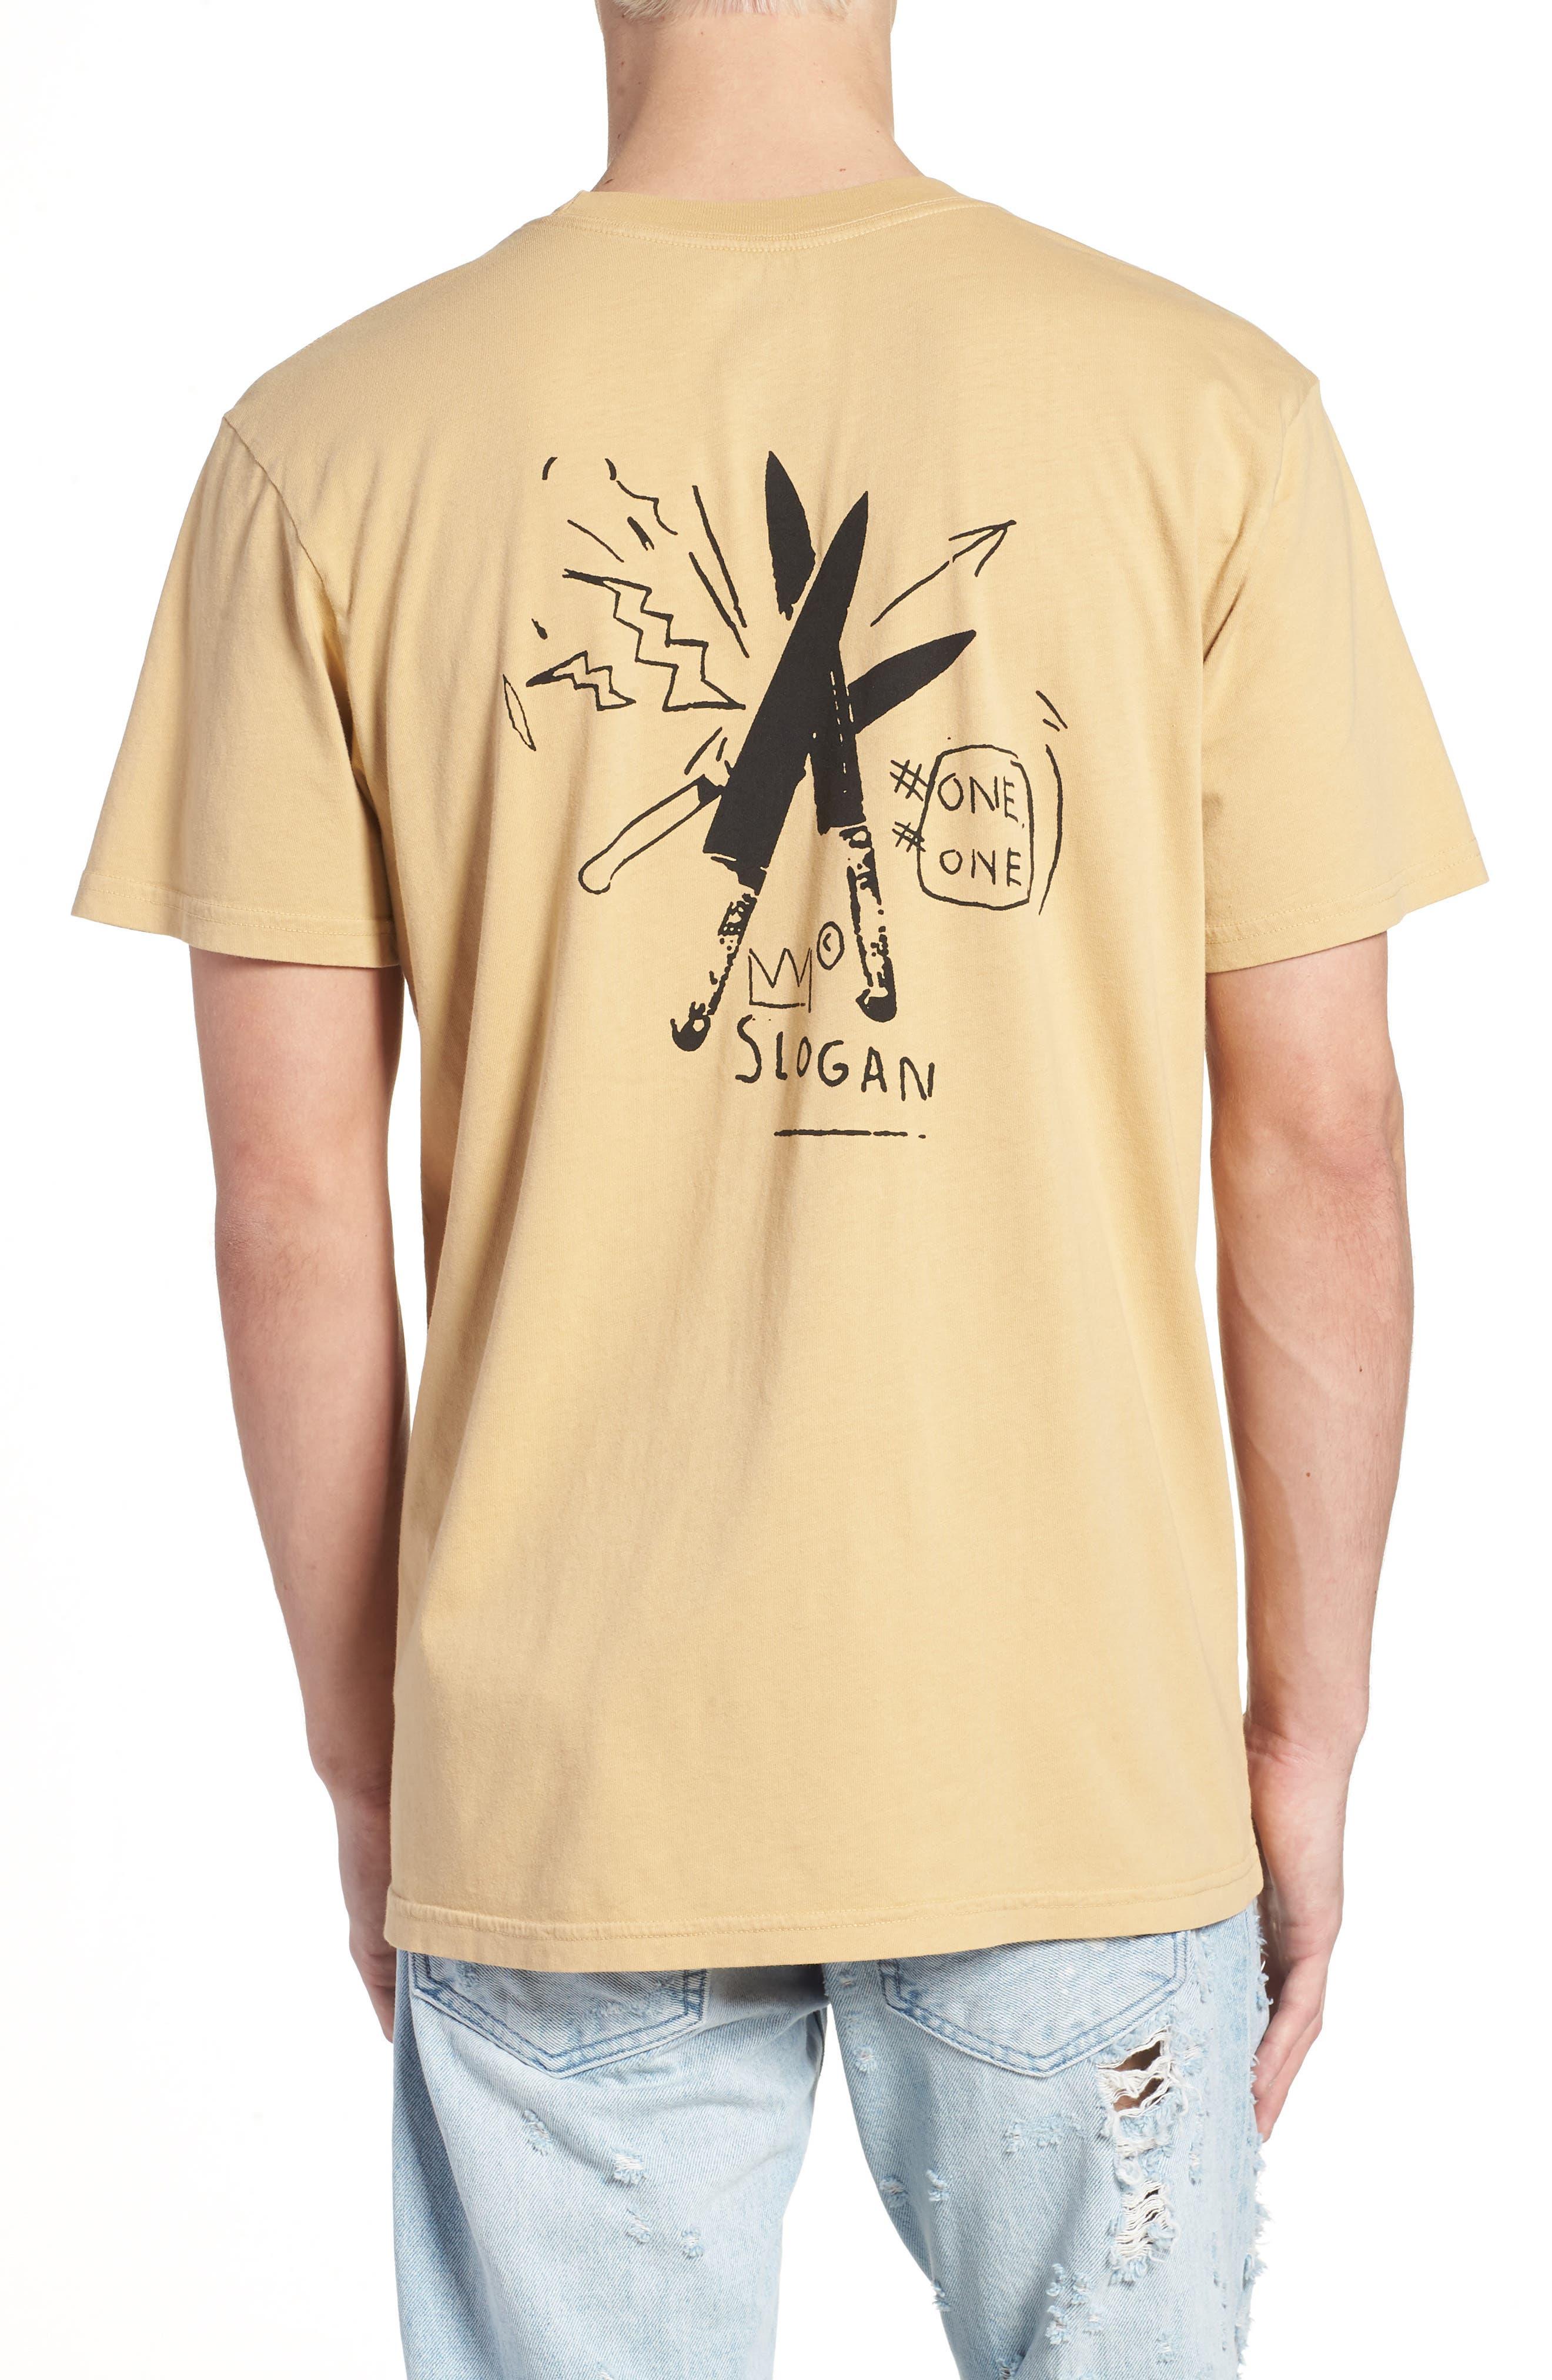 x Warhol Slogan T-Shirt,                             Alternate thumbnail 2, color,                             Straw